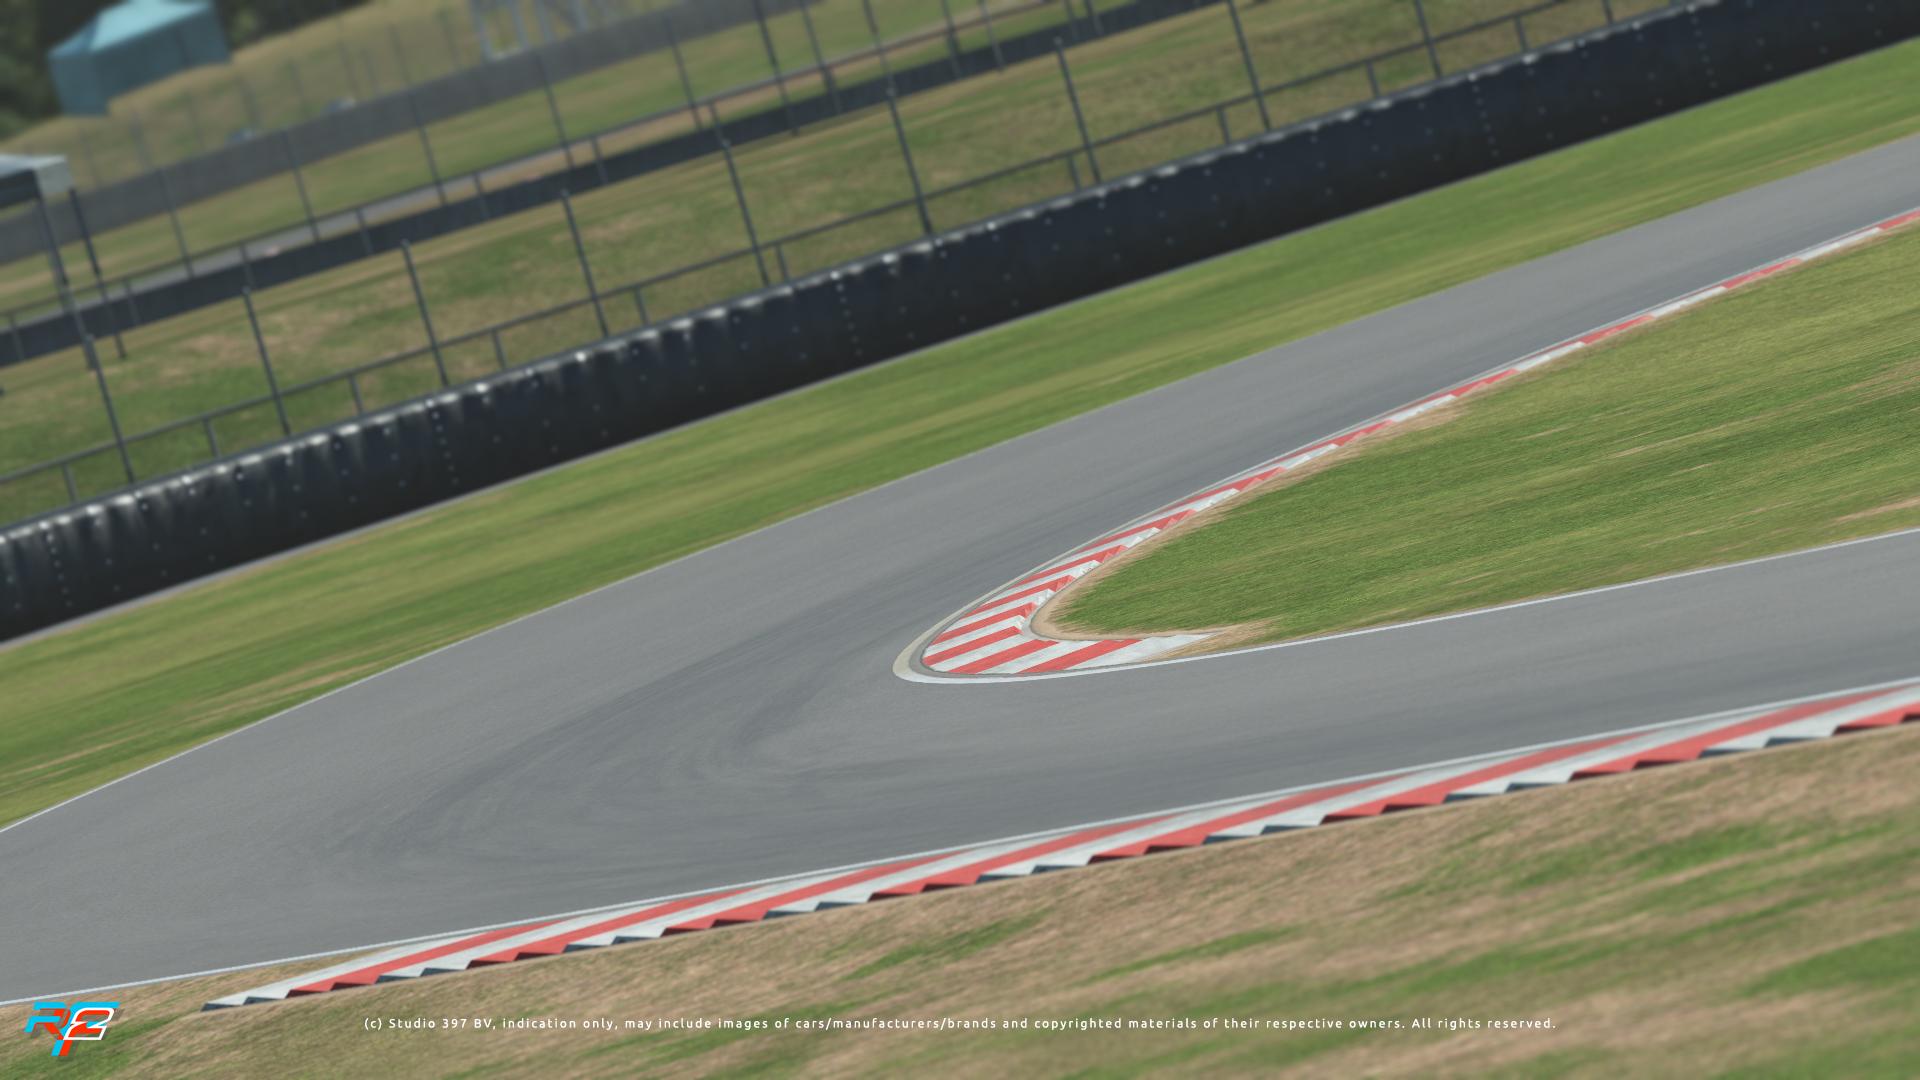 portland_2020_screen_04 Portland International Raceway for rFactor 2 – Released